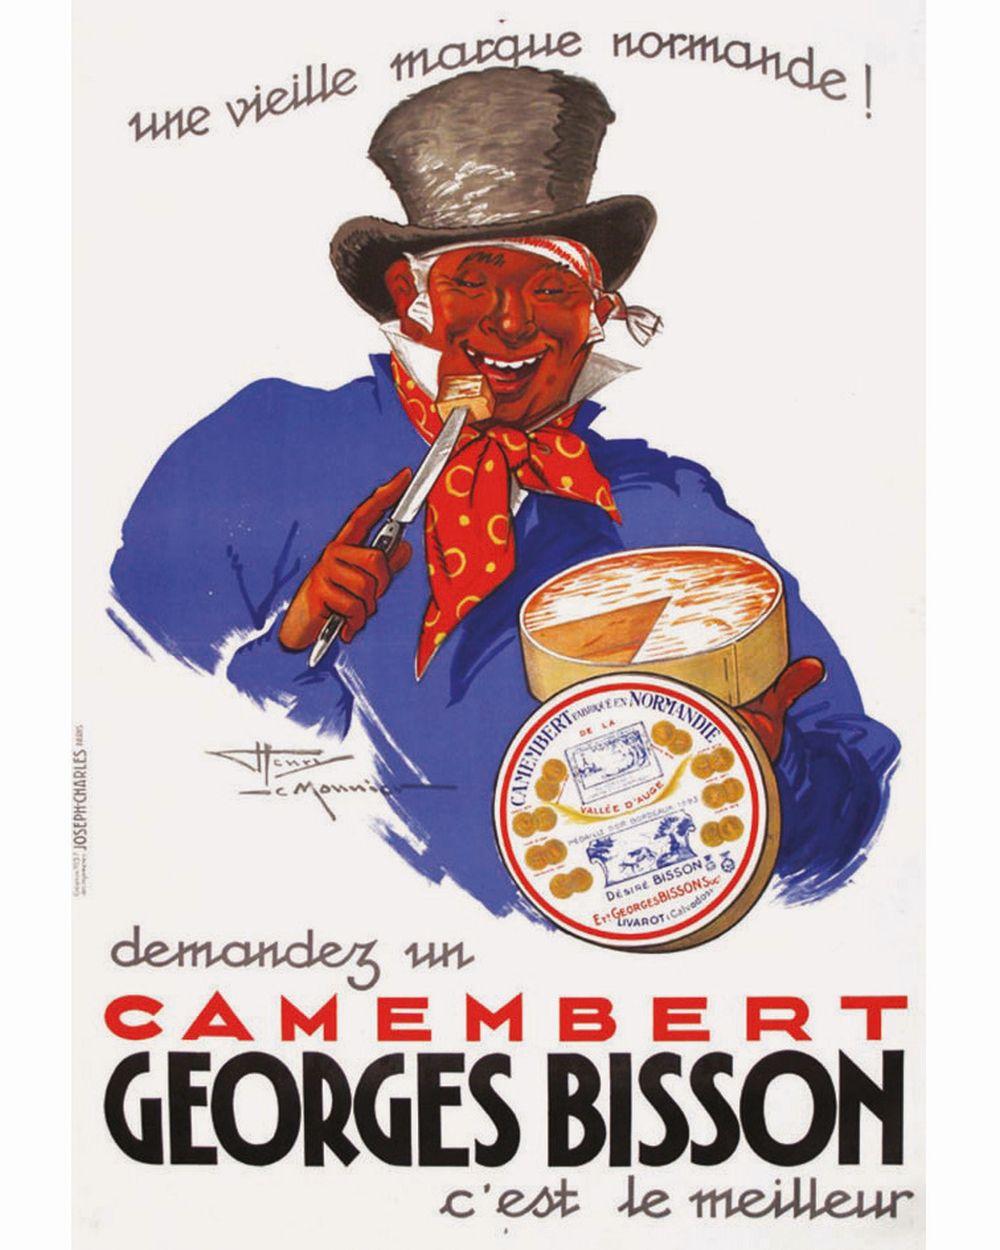 LEMONNIER HENRY - Camembert Georges Bisson     1937  Livarot ( Calvados )